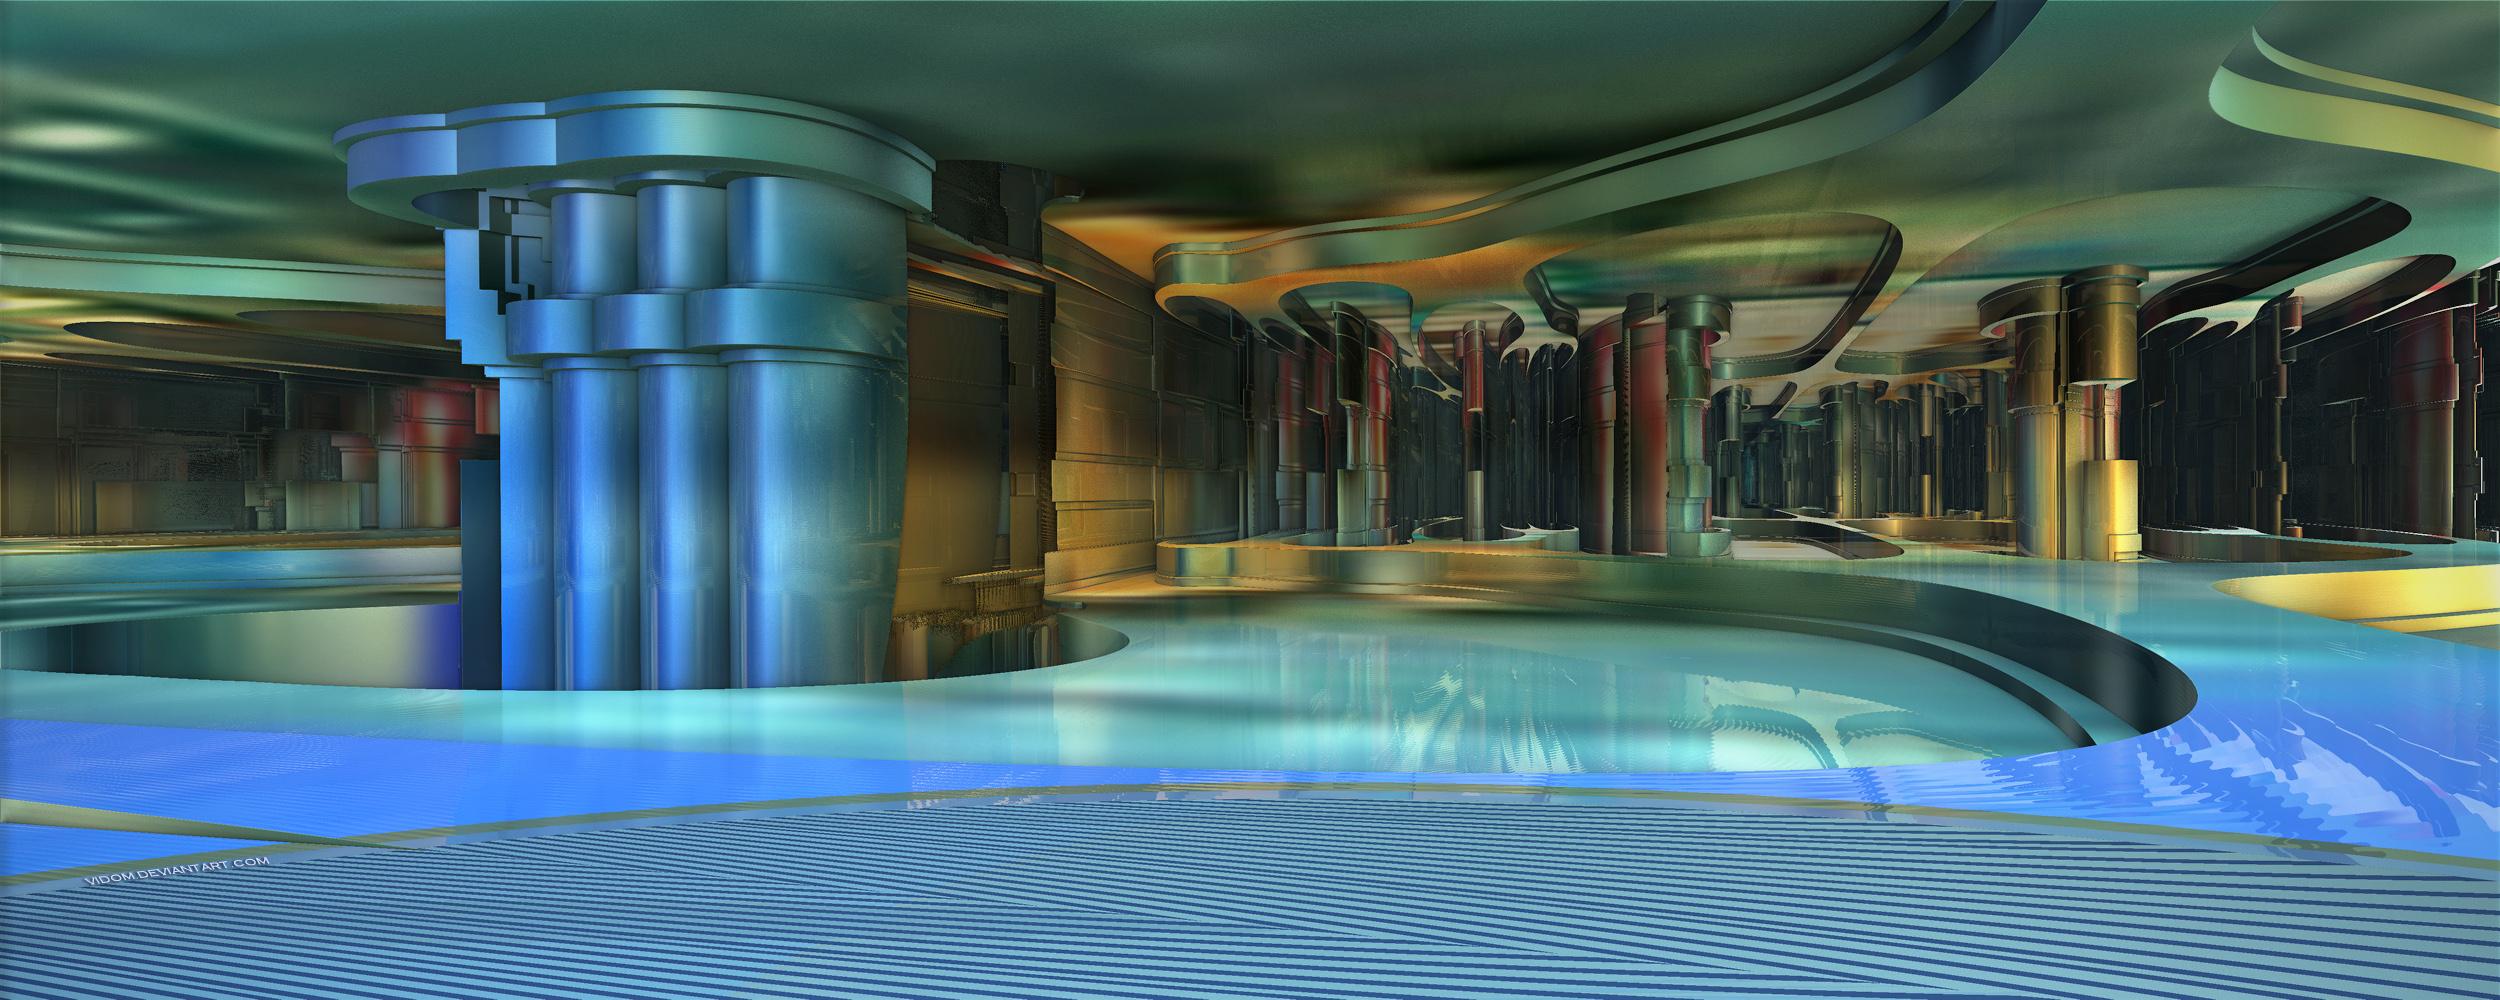 Water storage area by Vidom